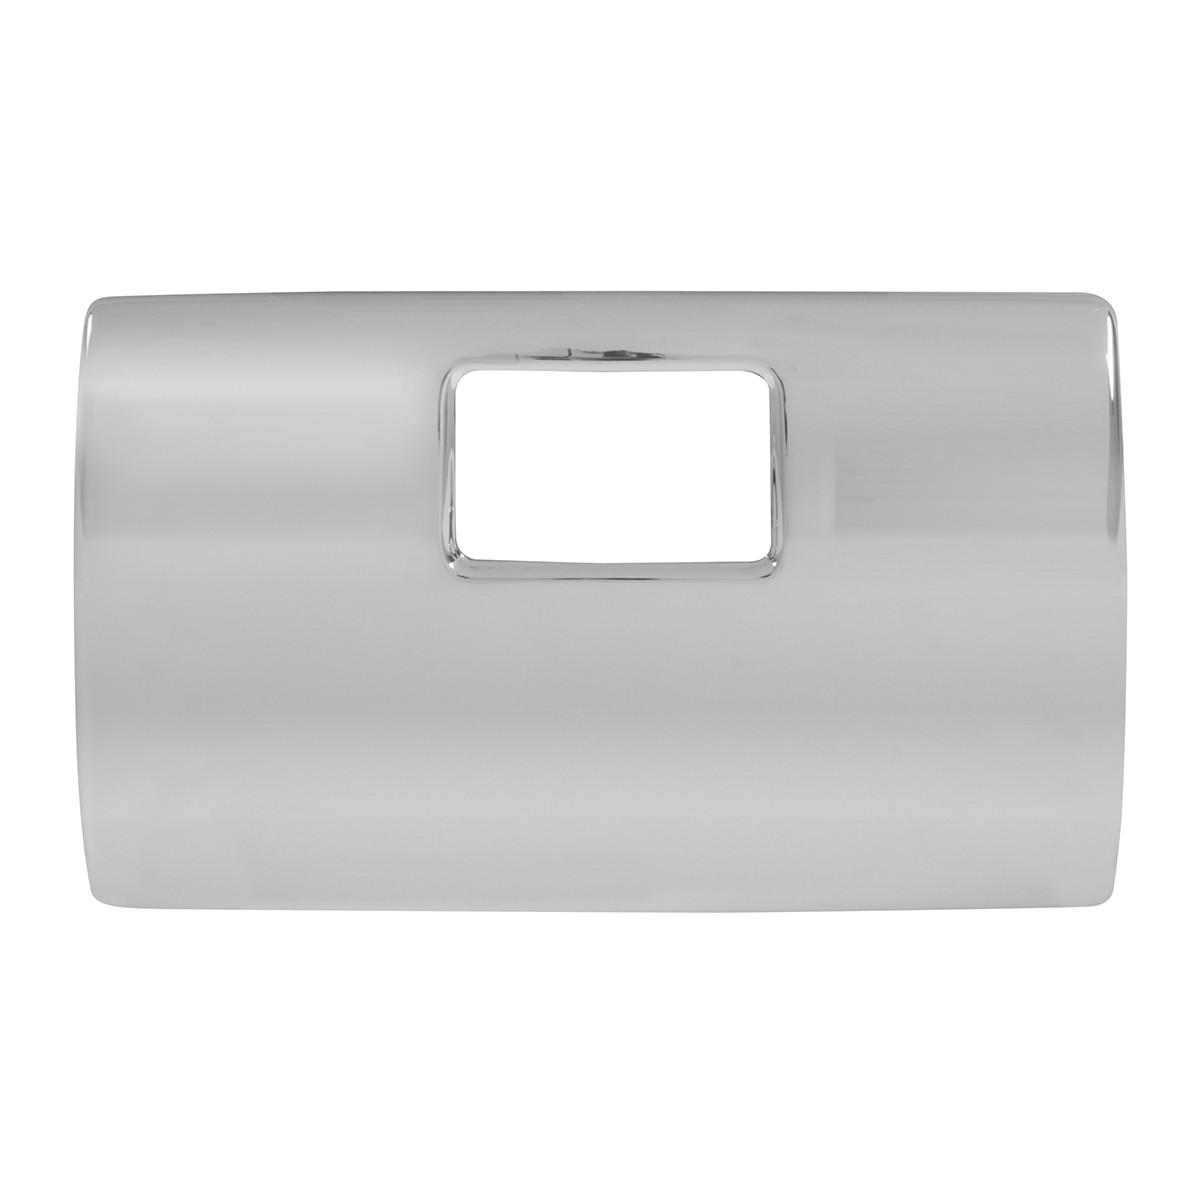 67953 Glove Box Trim for Peterbilt 20006 & Later